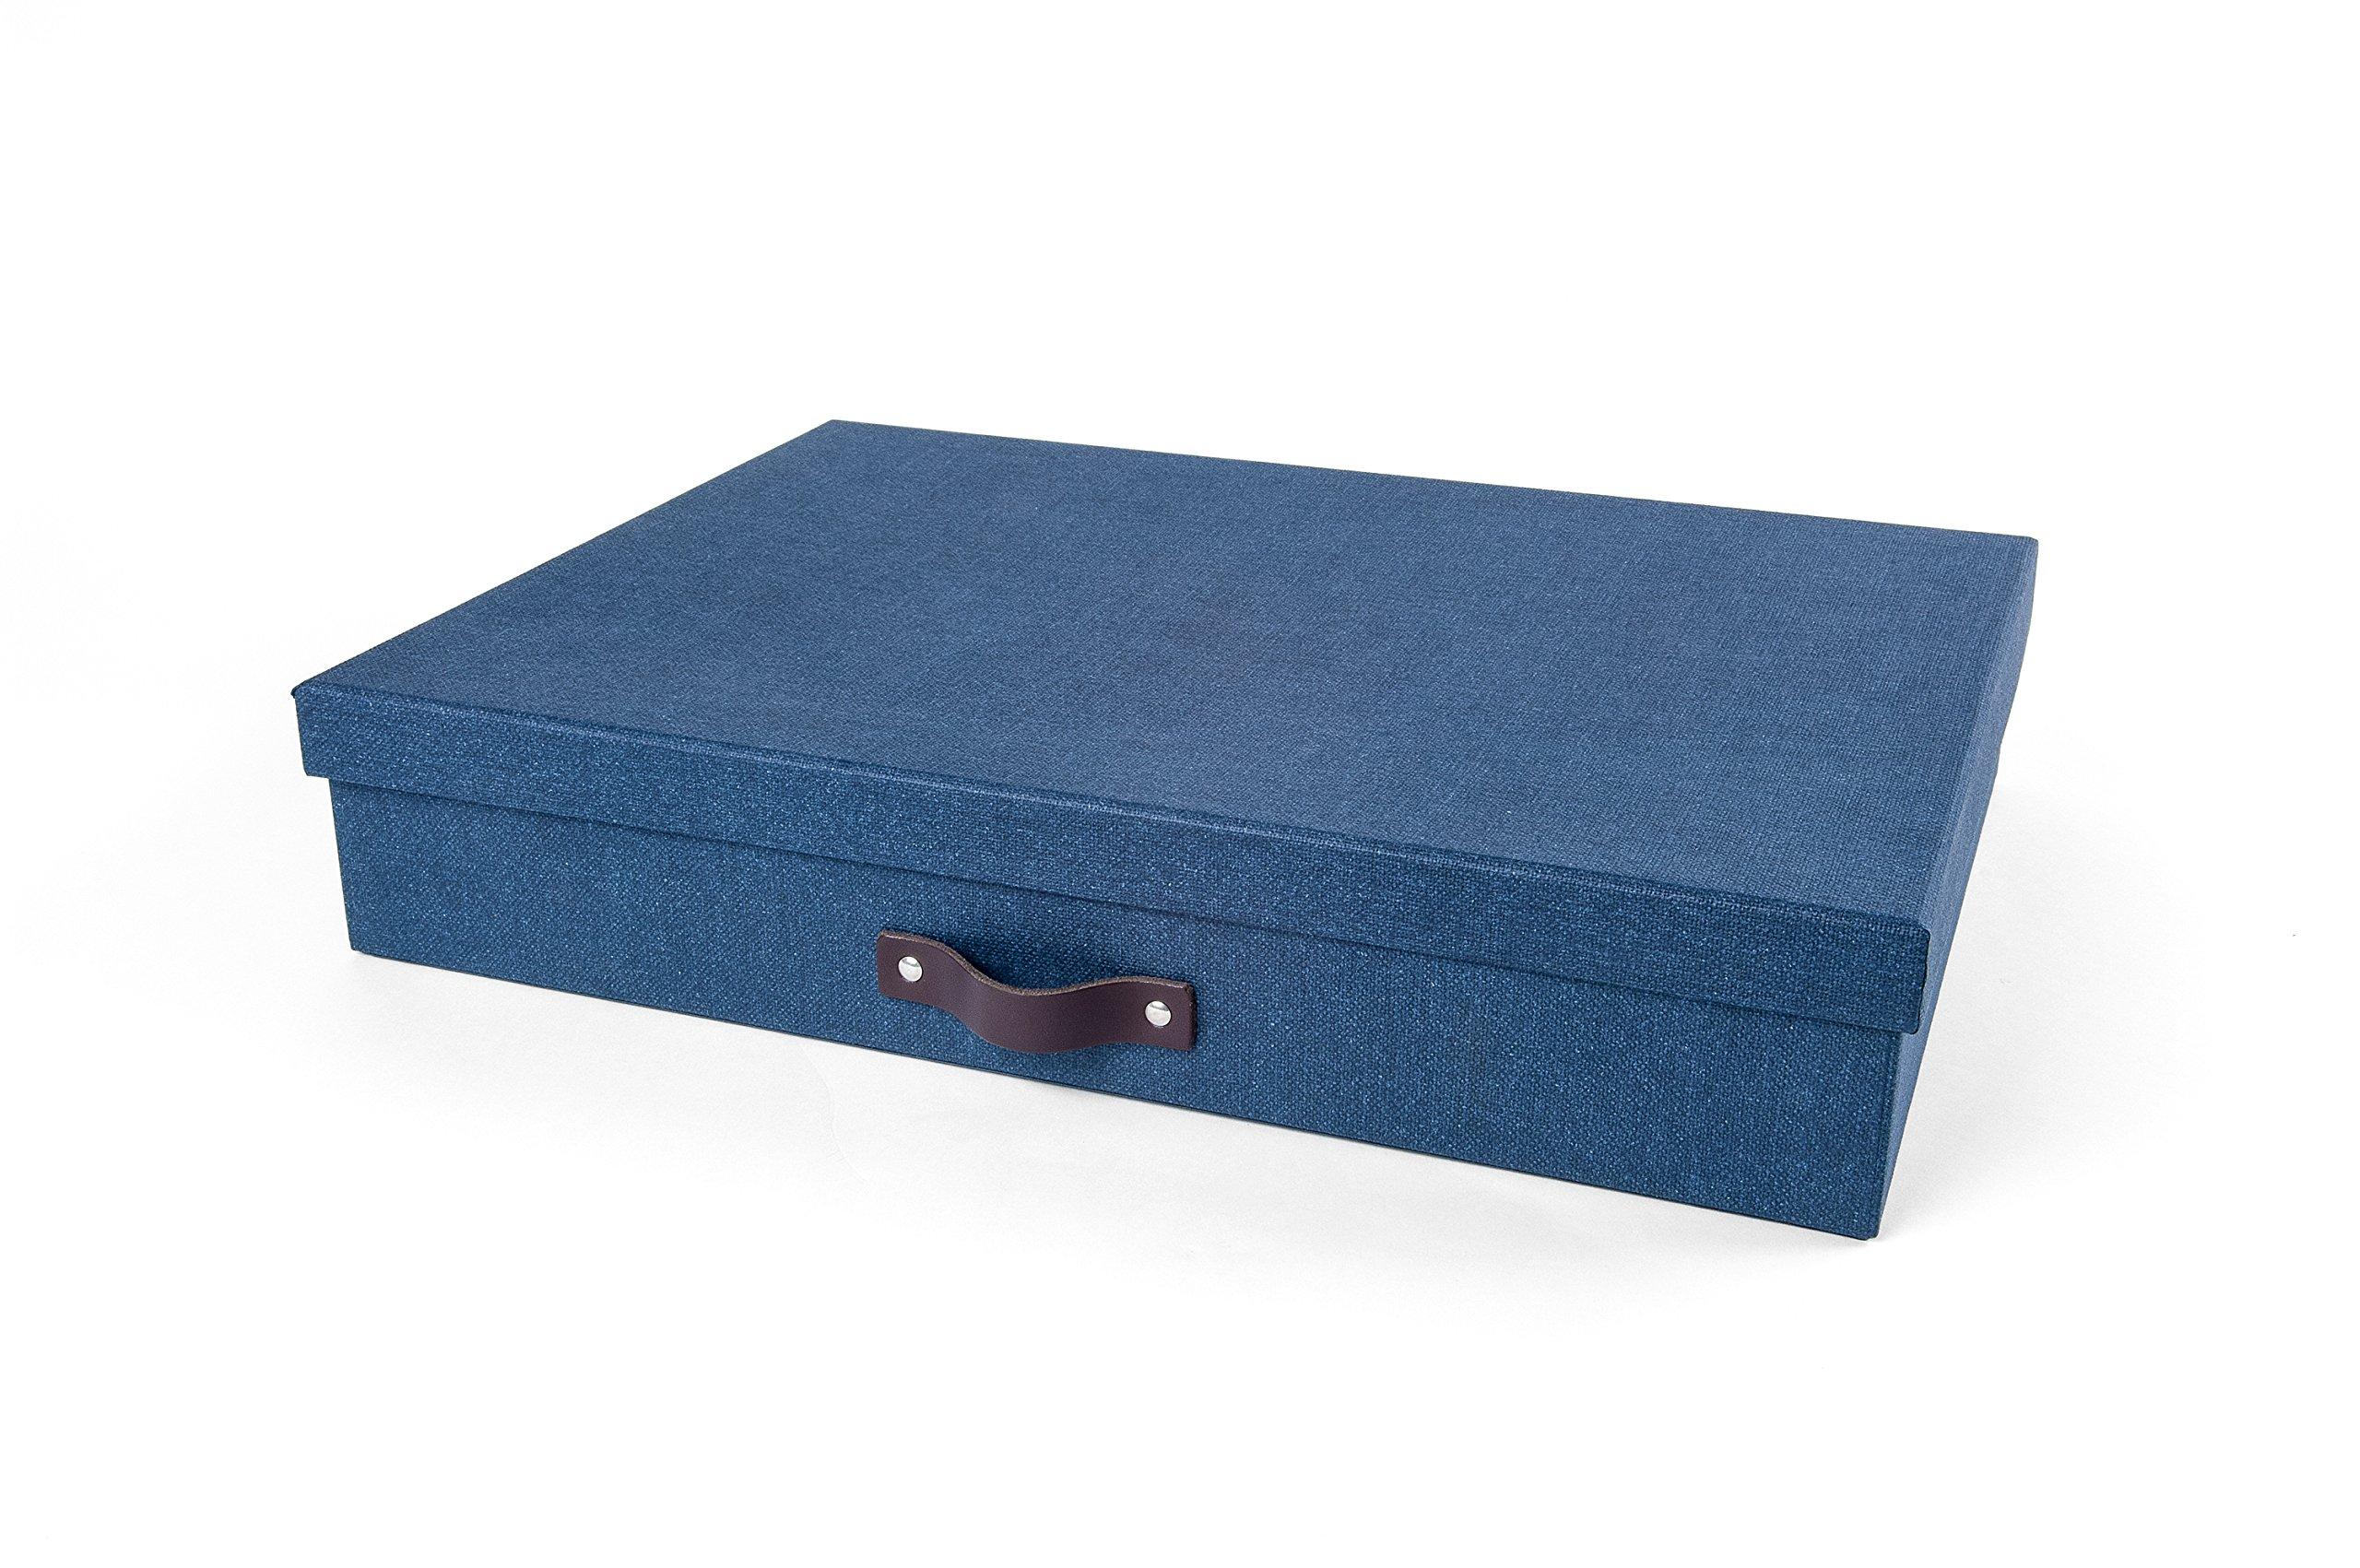 Bigso 9341C38 Sverker Canvas Paper Laminate Art Storage Box, Blue